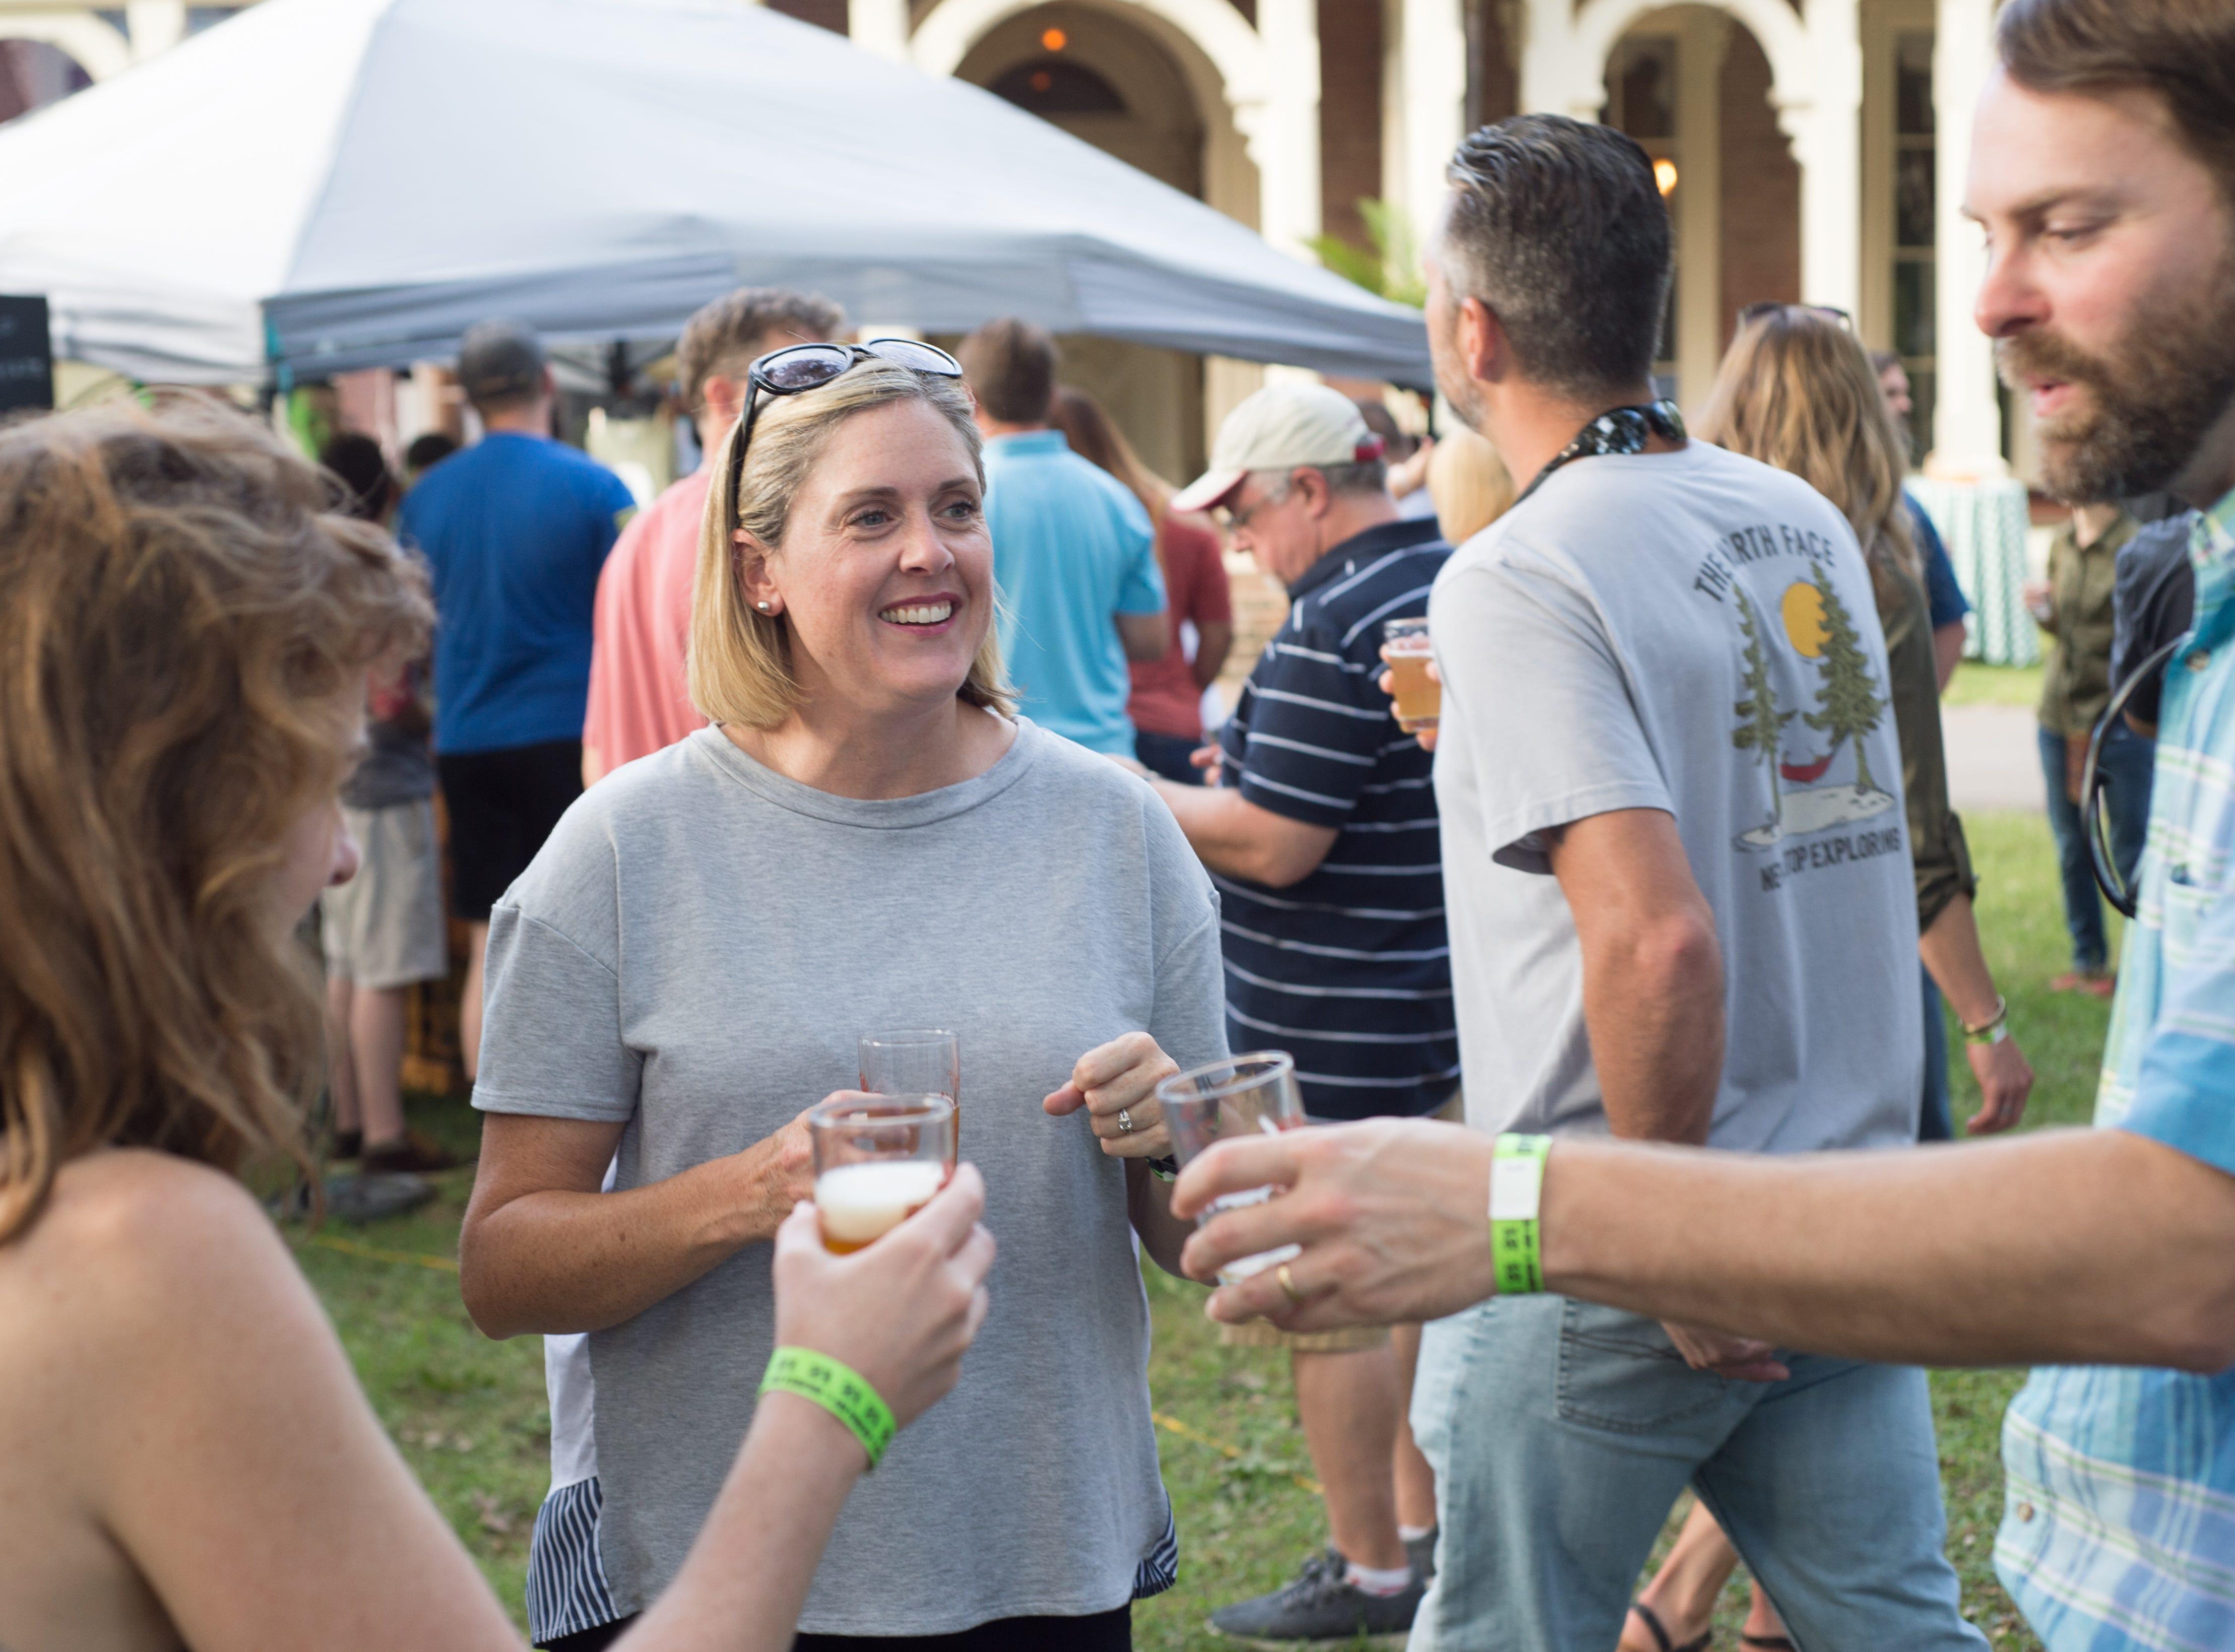 Amy Jackson has fun at Oktoberfest at Oaklands Mansion in Murfreesboro on Saturday, Sept. 29.